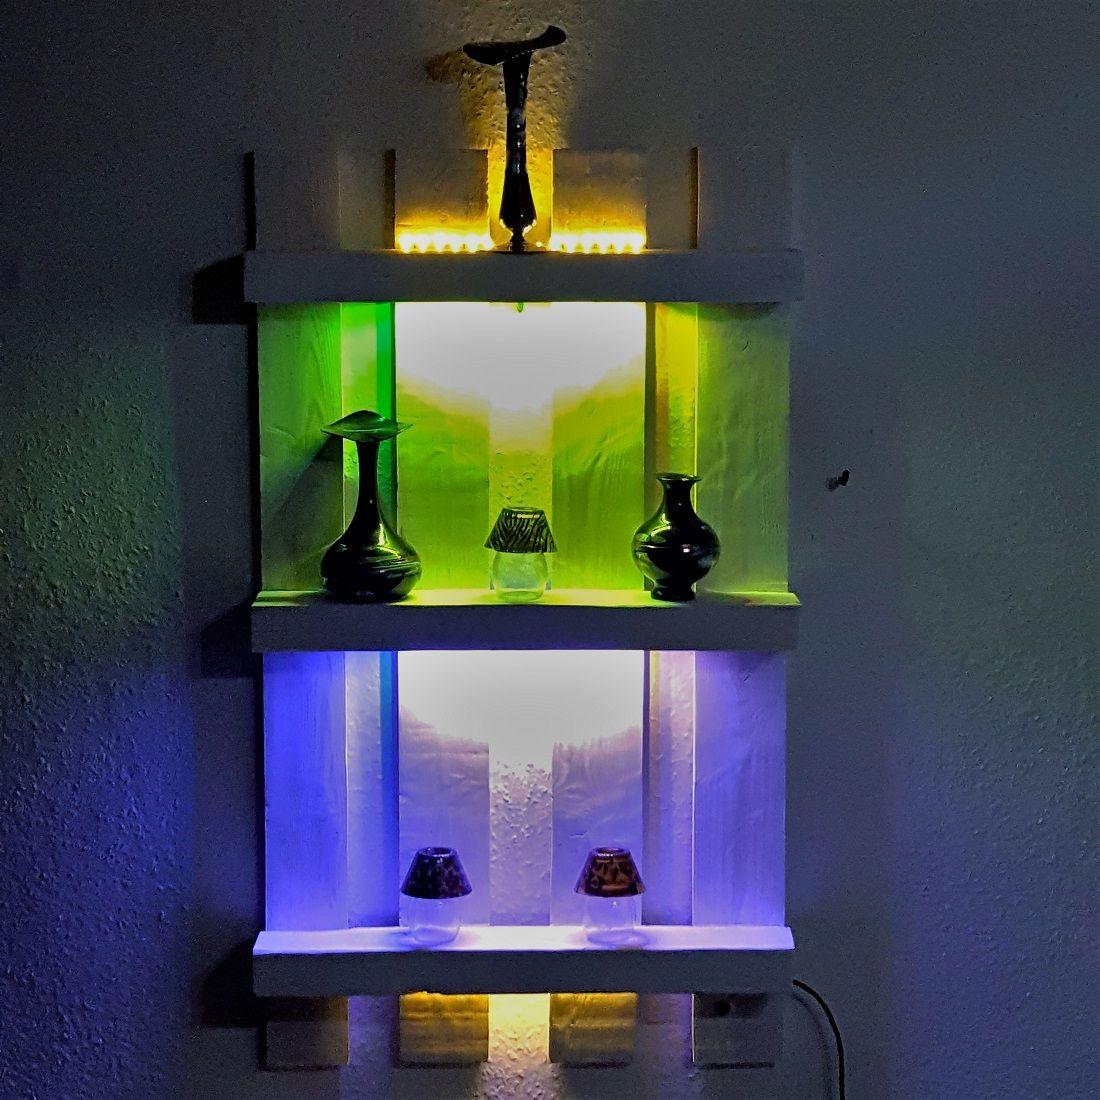 Wandregal Mit Led Beleuchtung Led Beleuchtung Beleuchtung Und Led